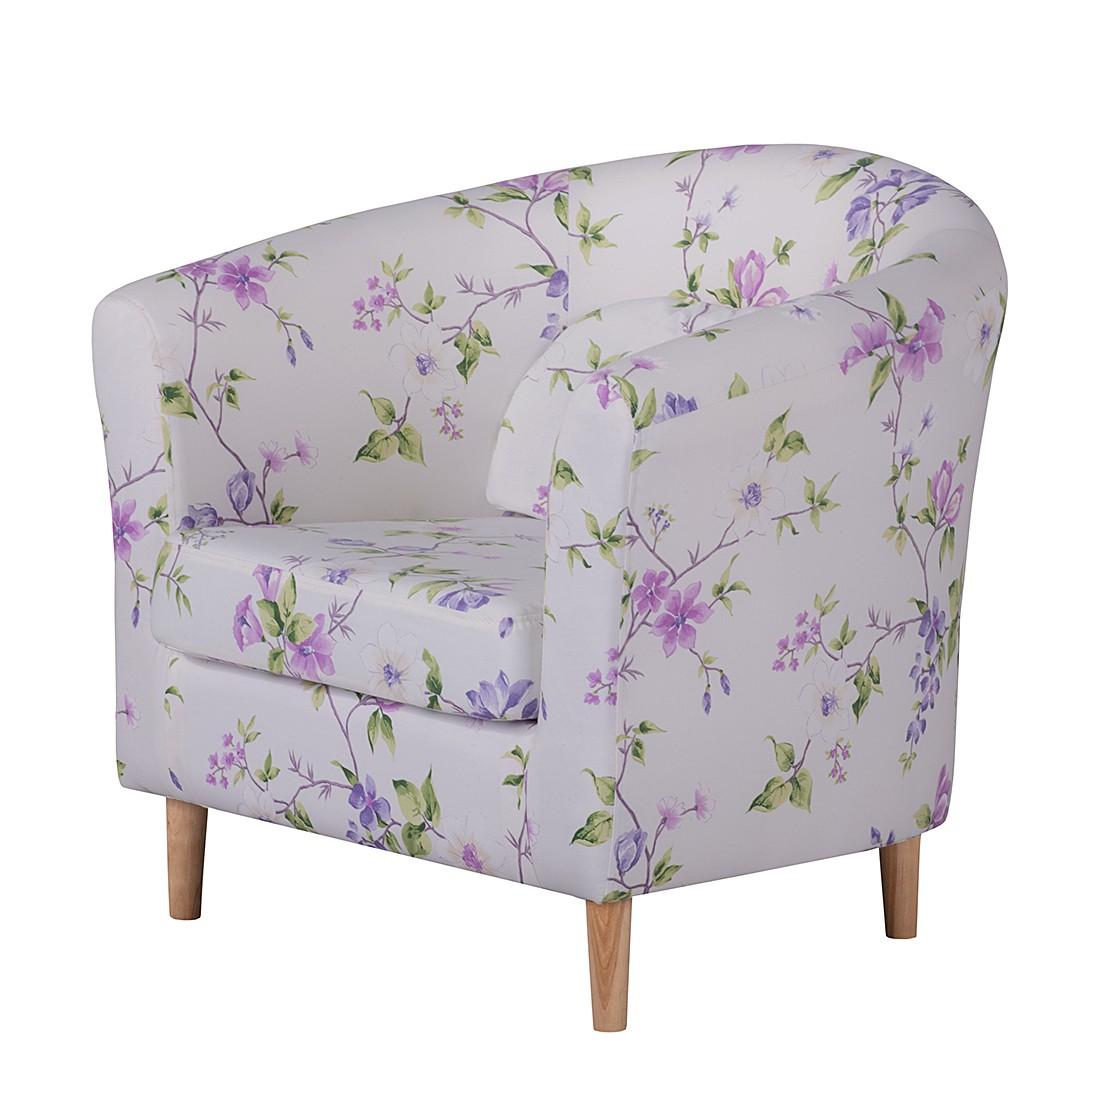 sessel philipp webstoff gebl mt wei lila fredriks g nstig online kaufen. Black Bedroom Furniture Sets. Home Design Ideas